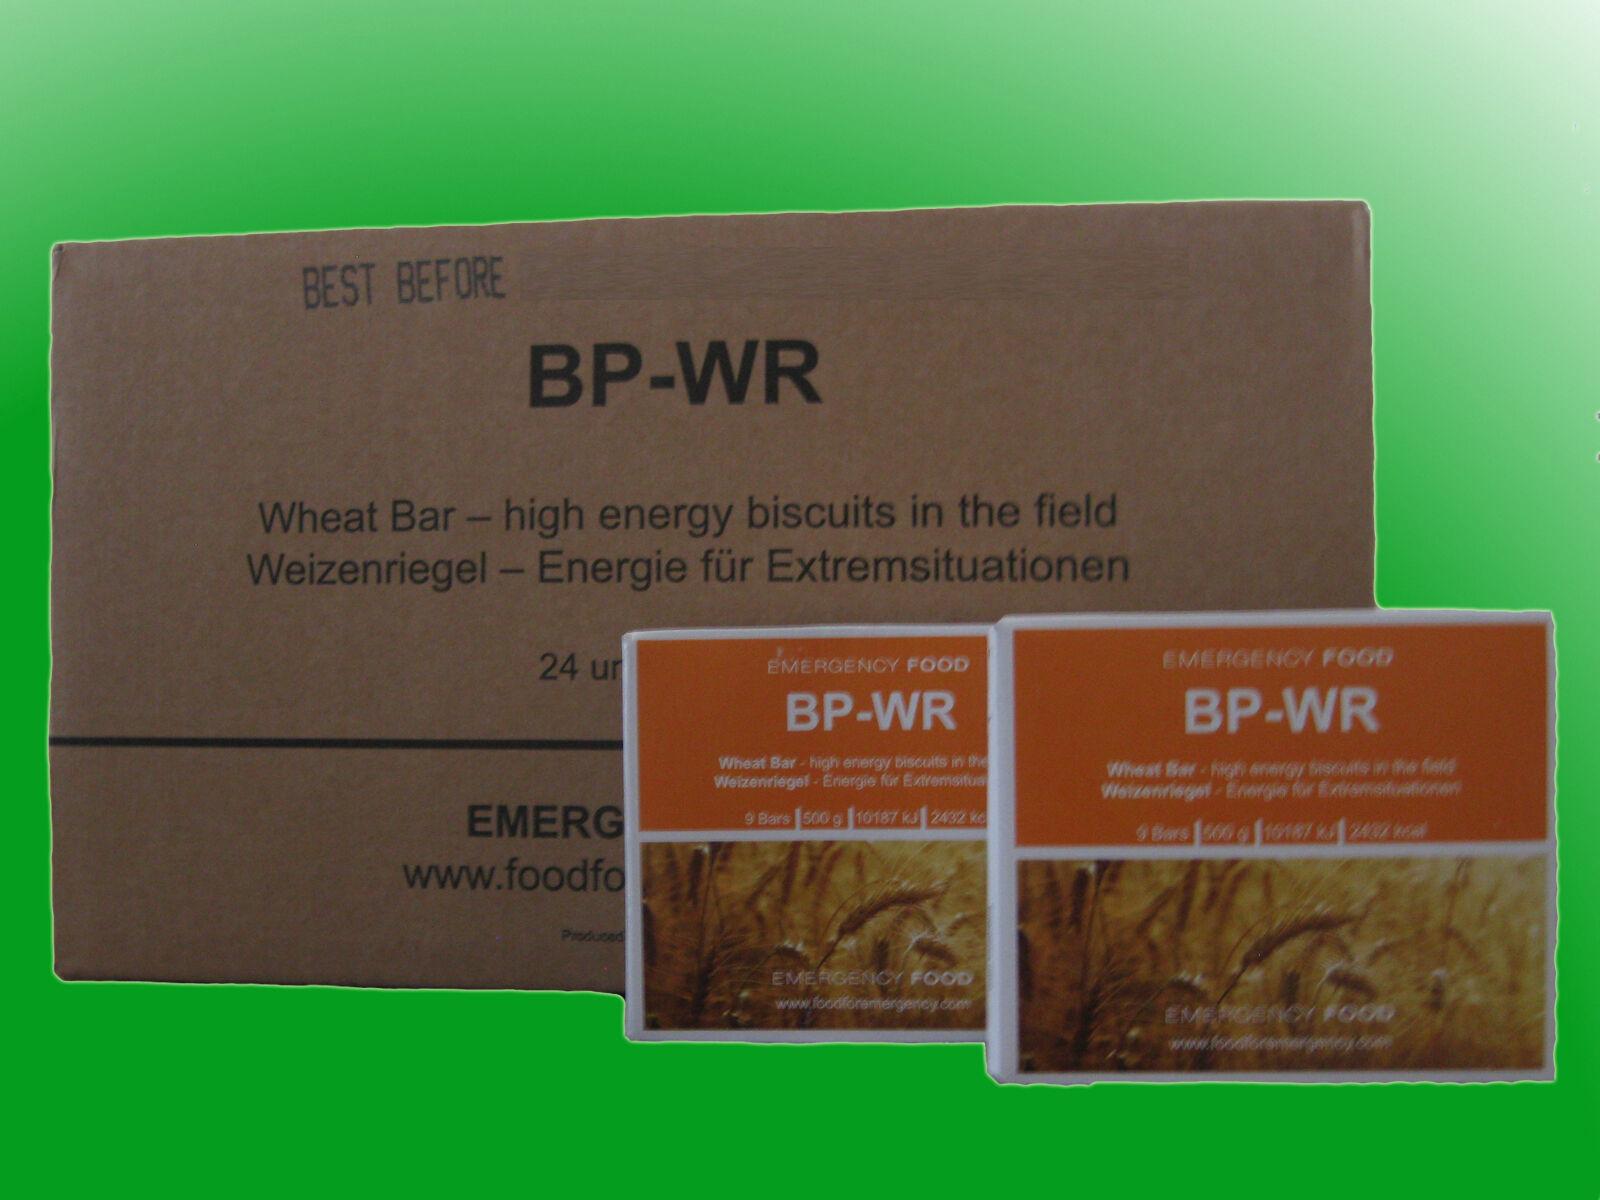 ( /kg) 1 Karton BP-WR Emergency Food, Notverpflegung, Langzeitnahrung